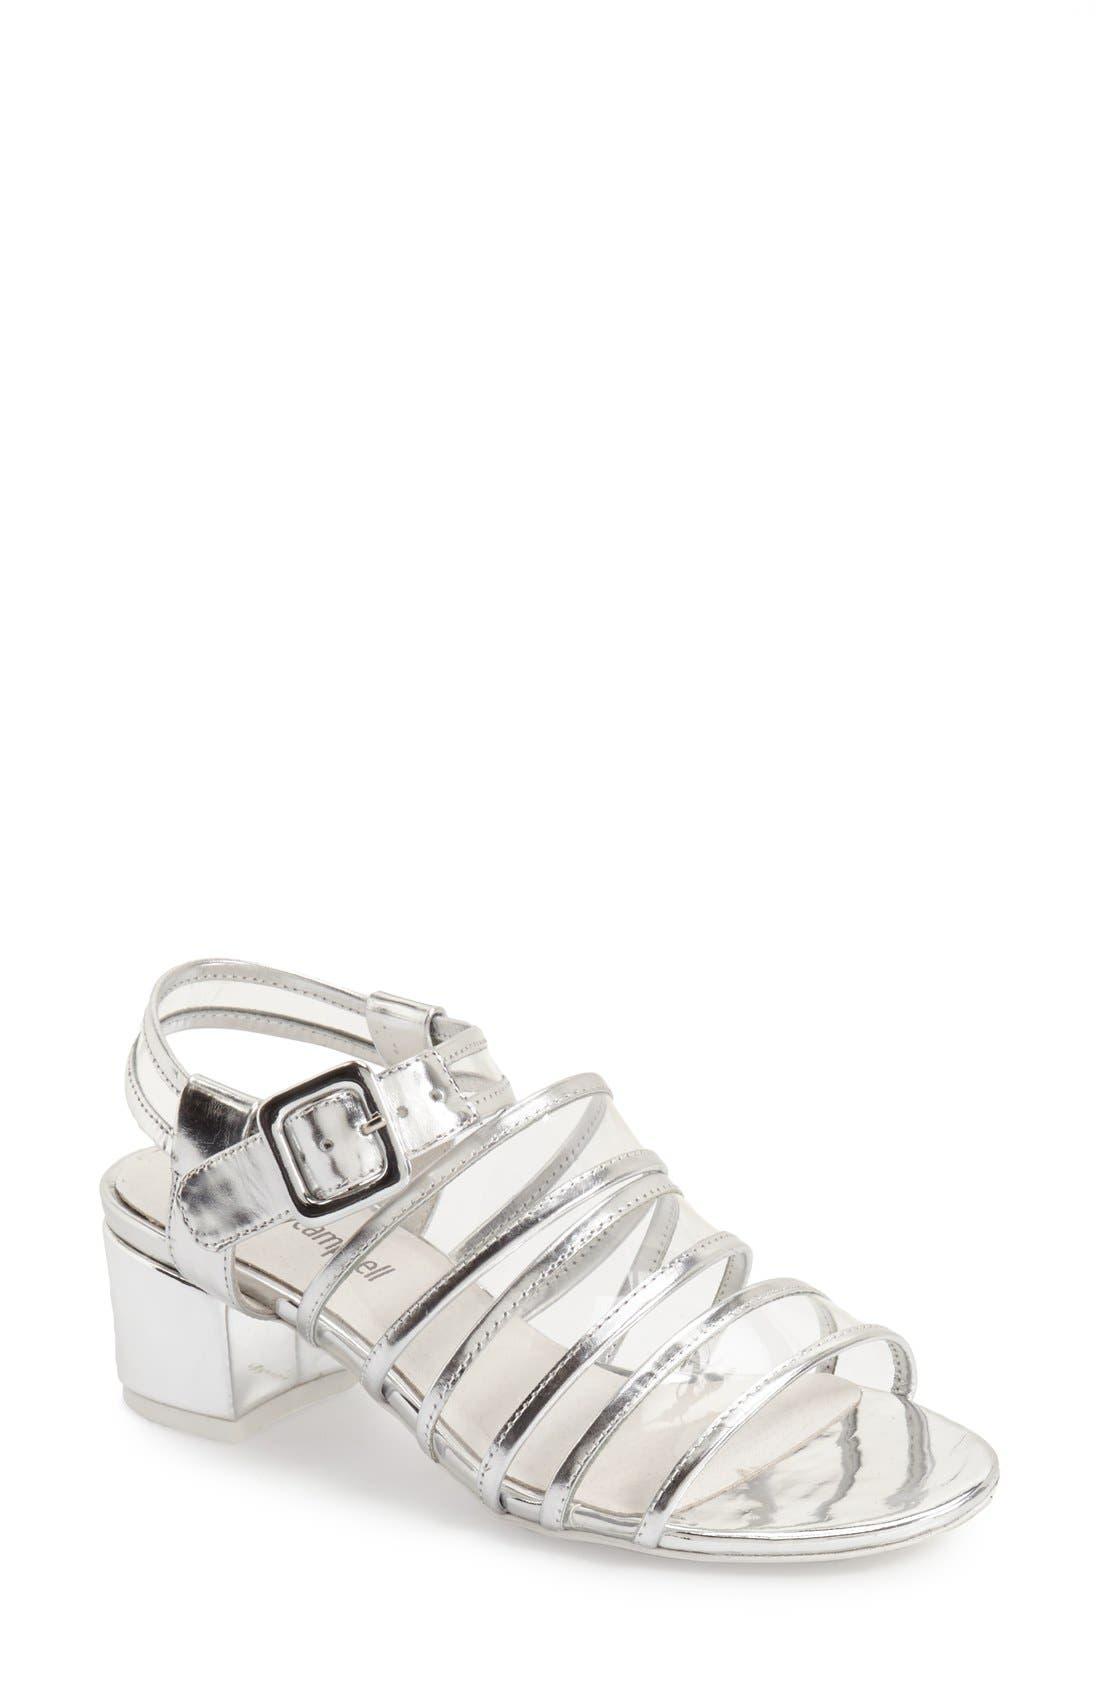 Alternate Image 1 Selected - Jeffrey Campbell 'Verina' Sandal (Women)